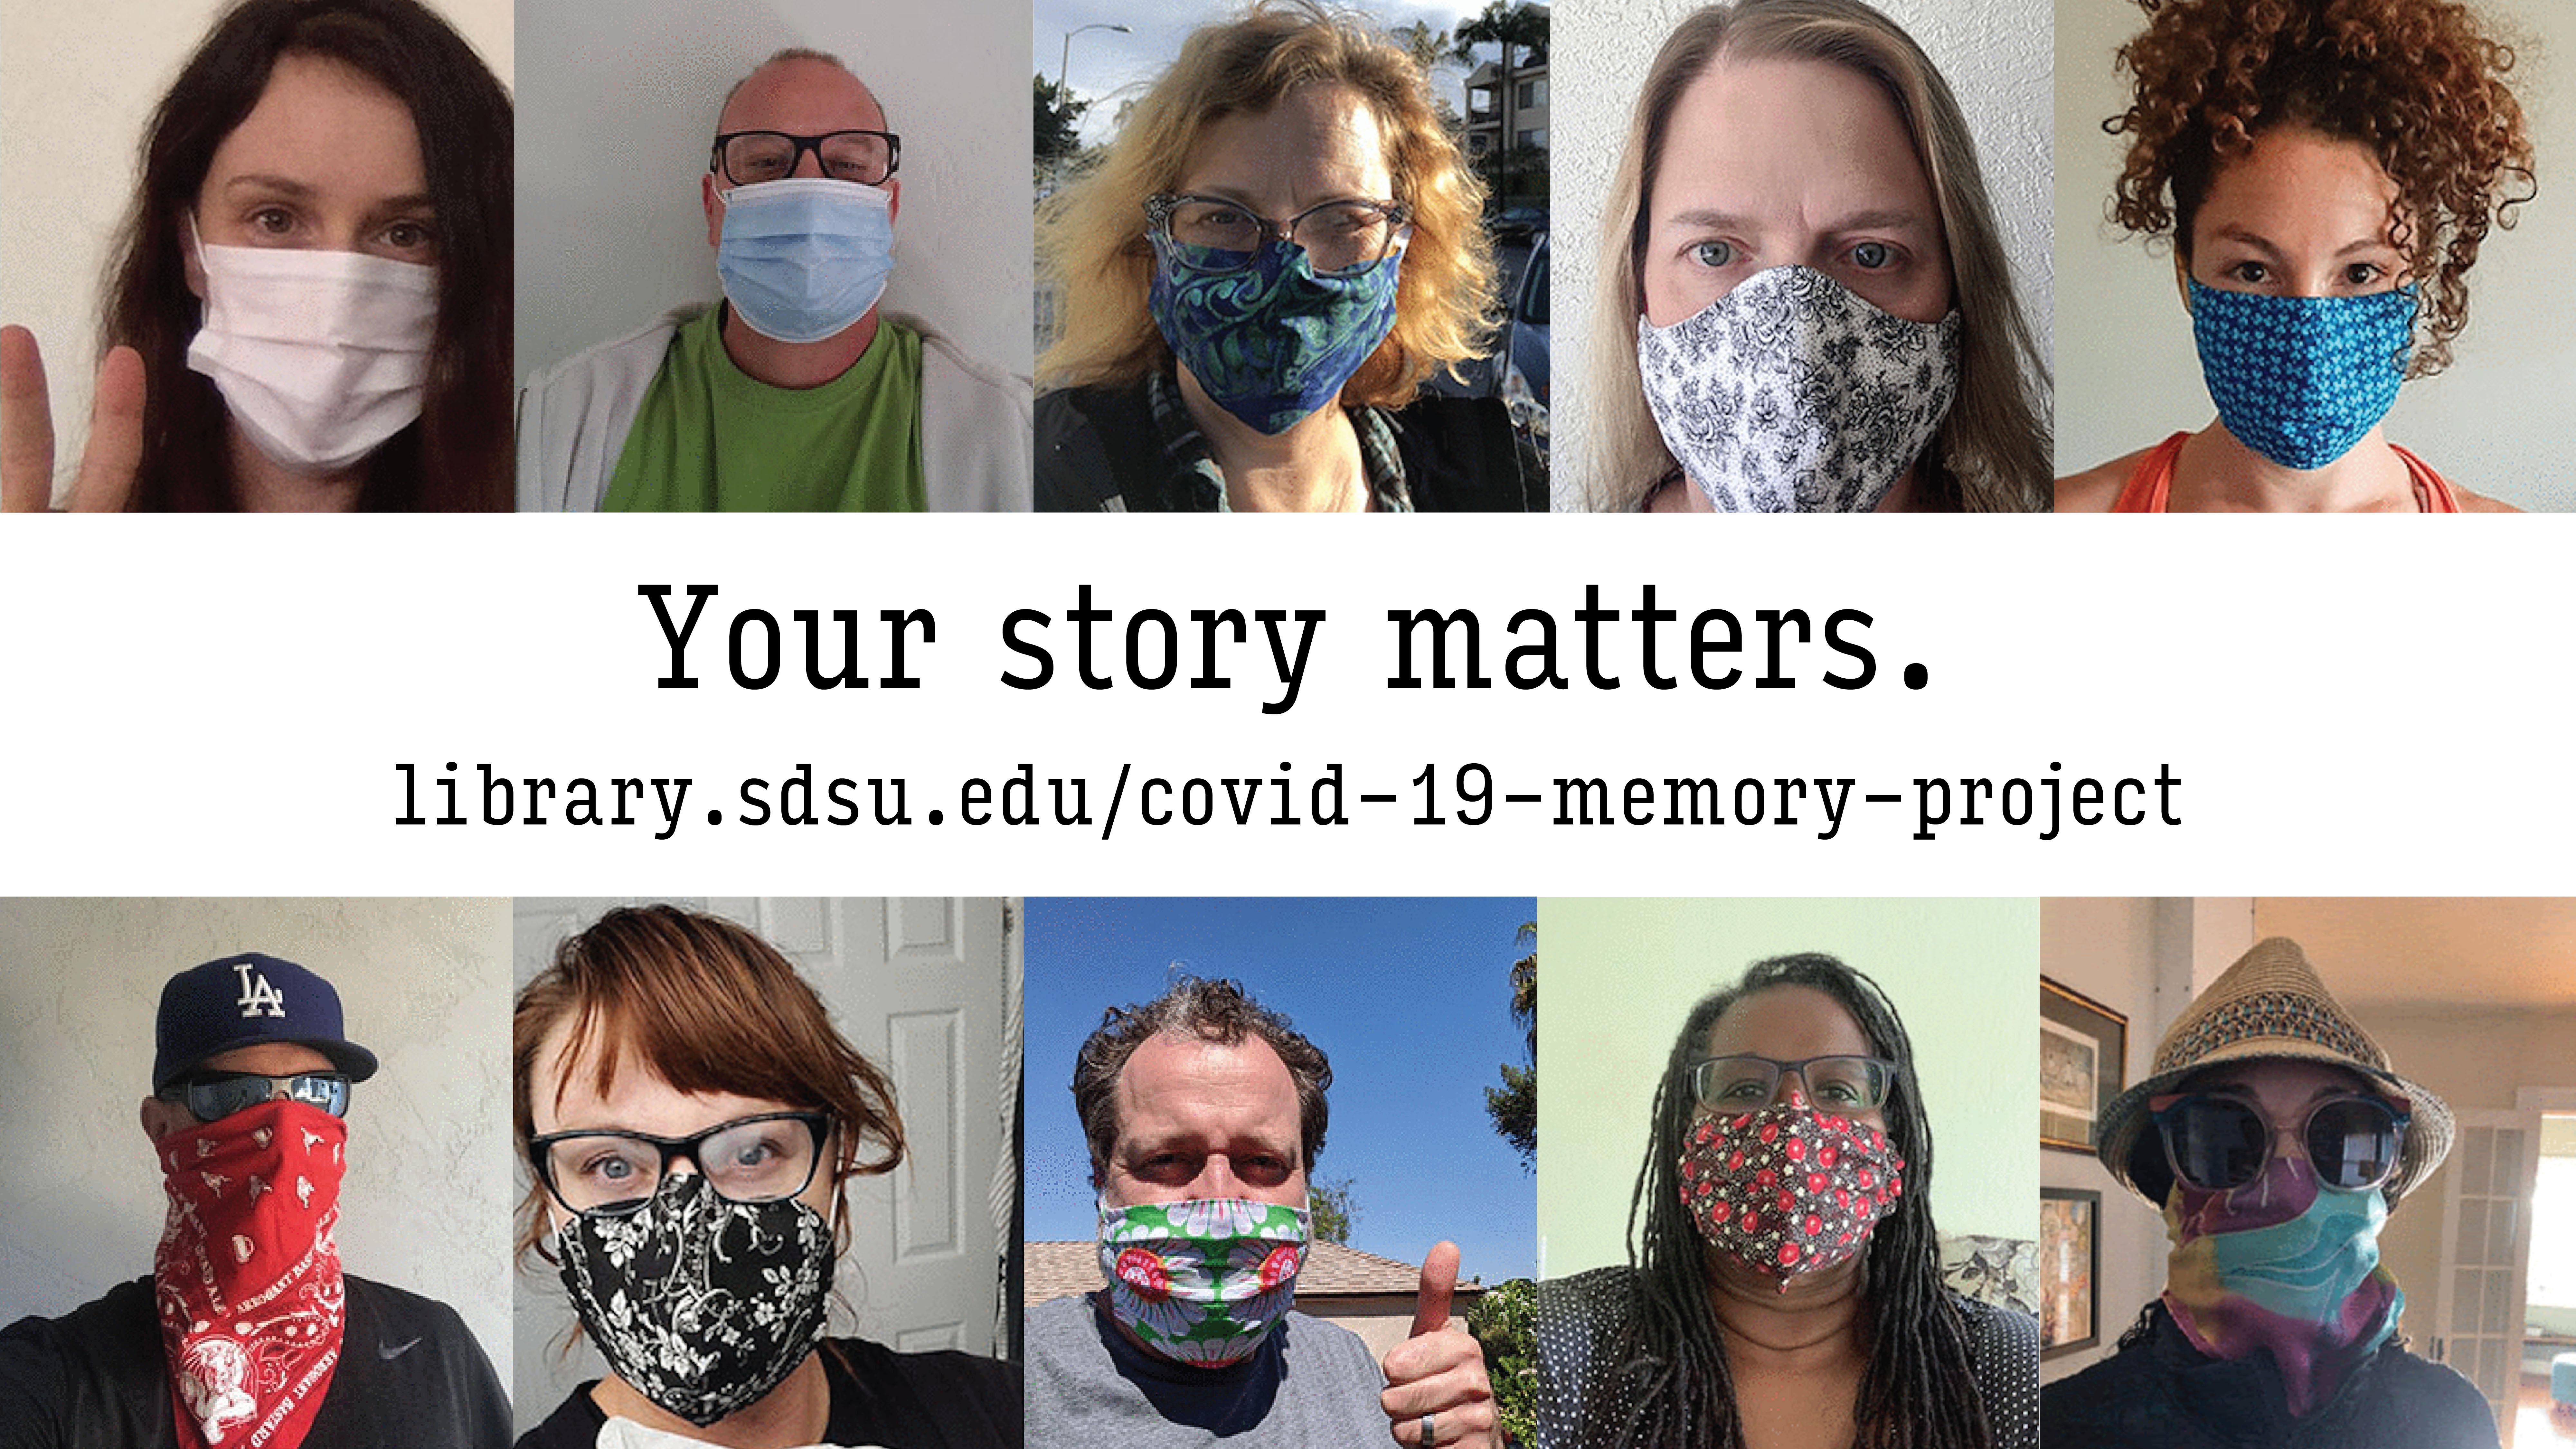 COVID-19 Memory Project